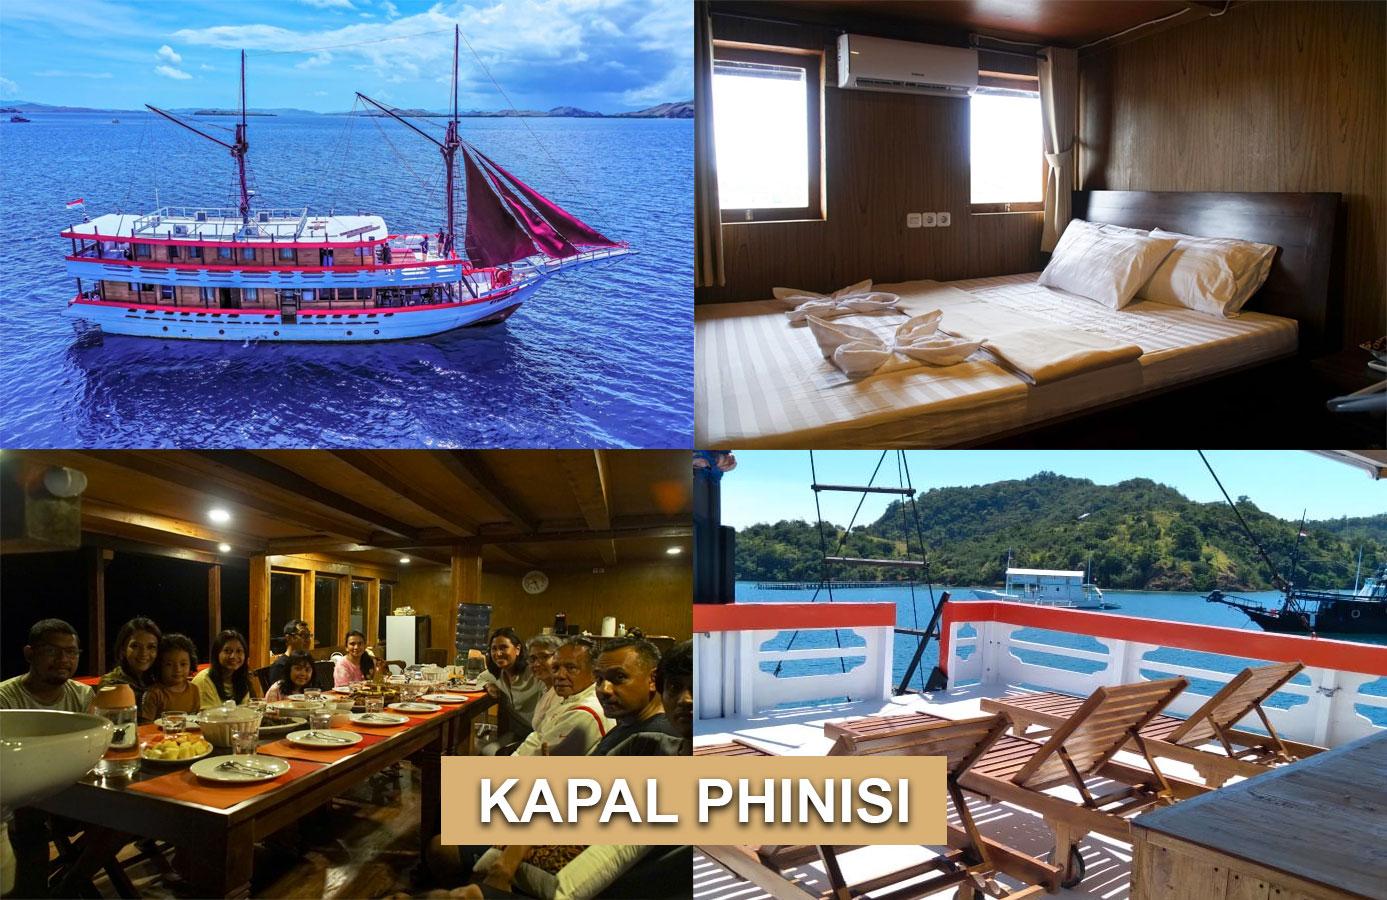 kapal-phinisi